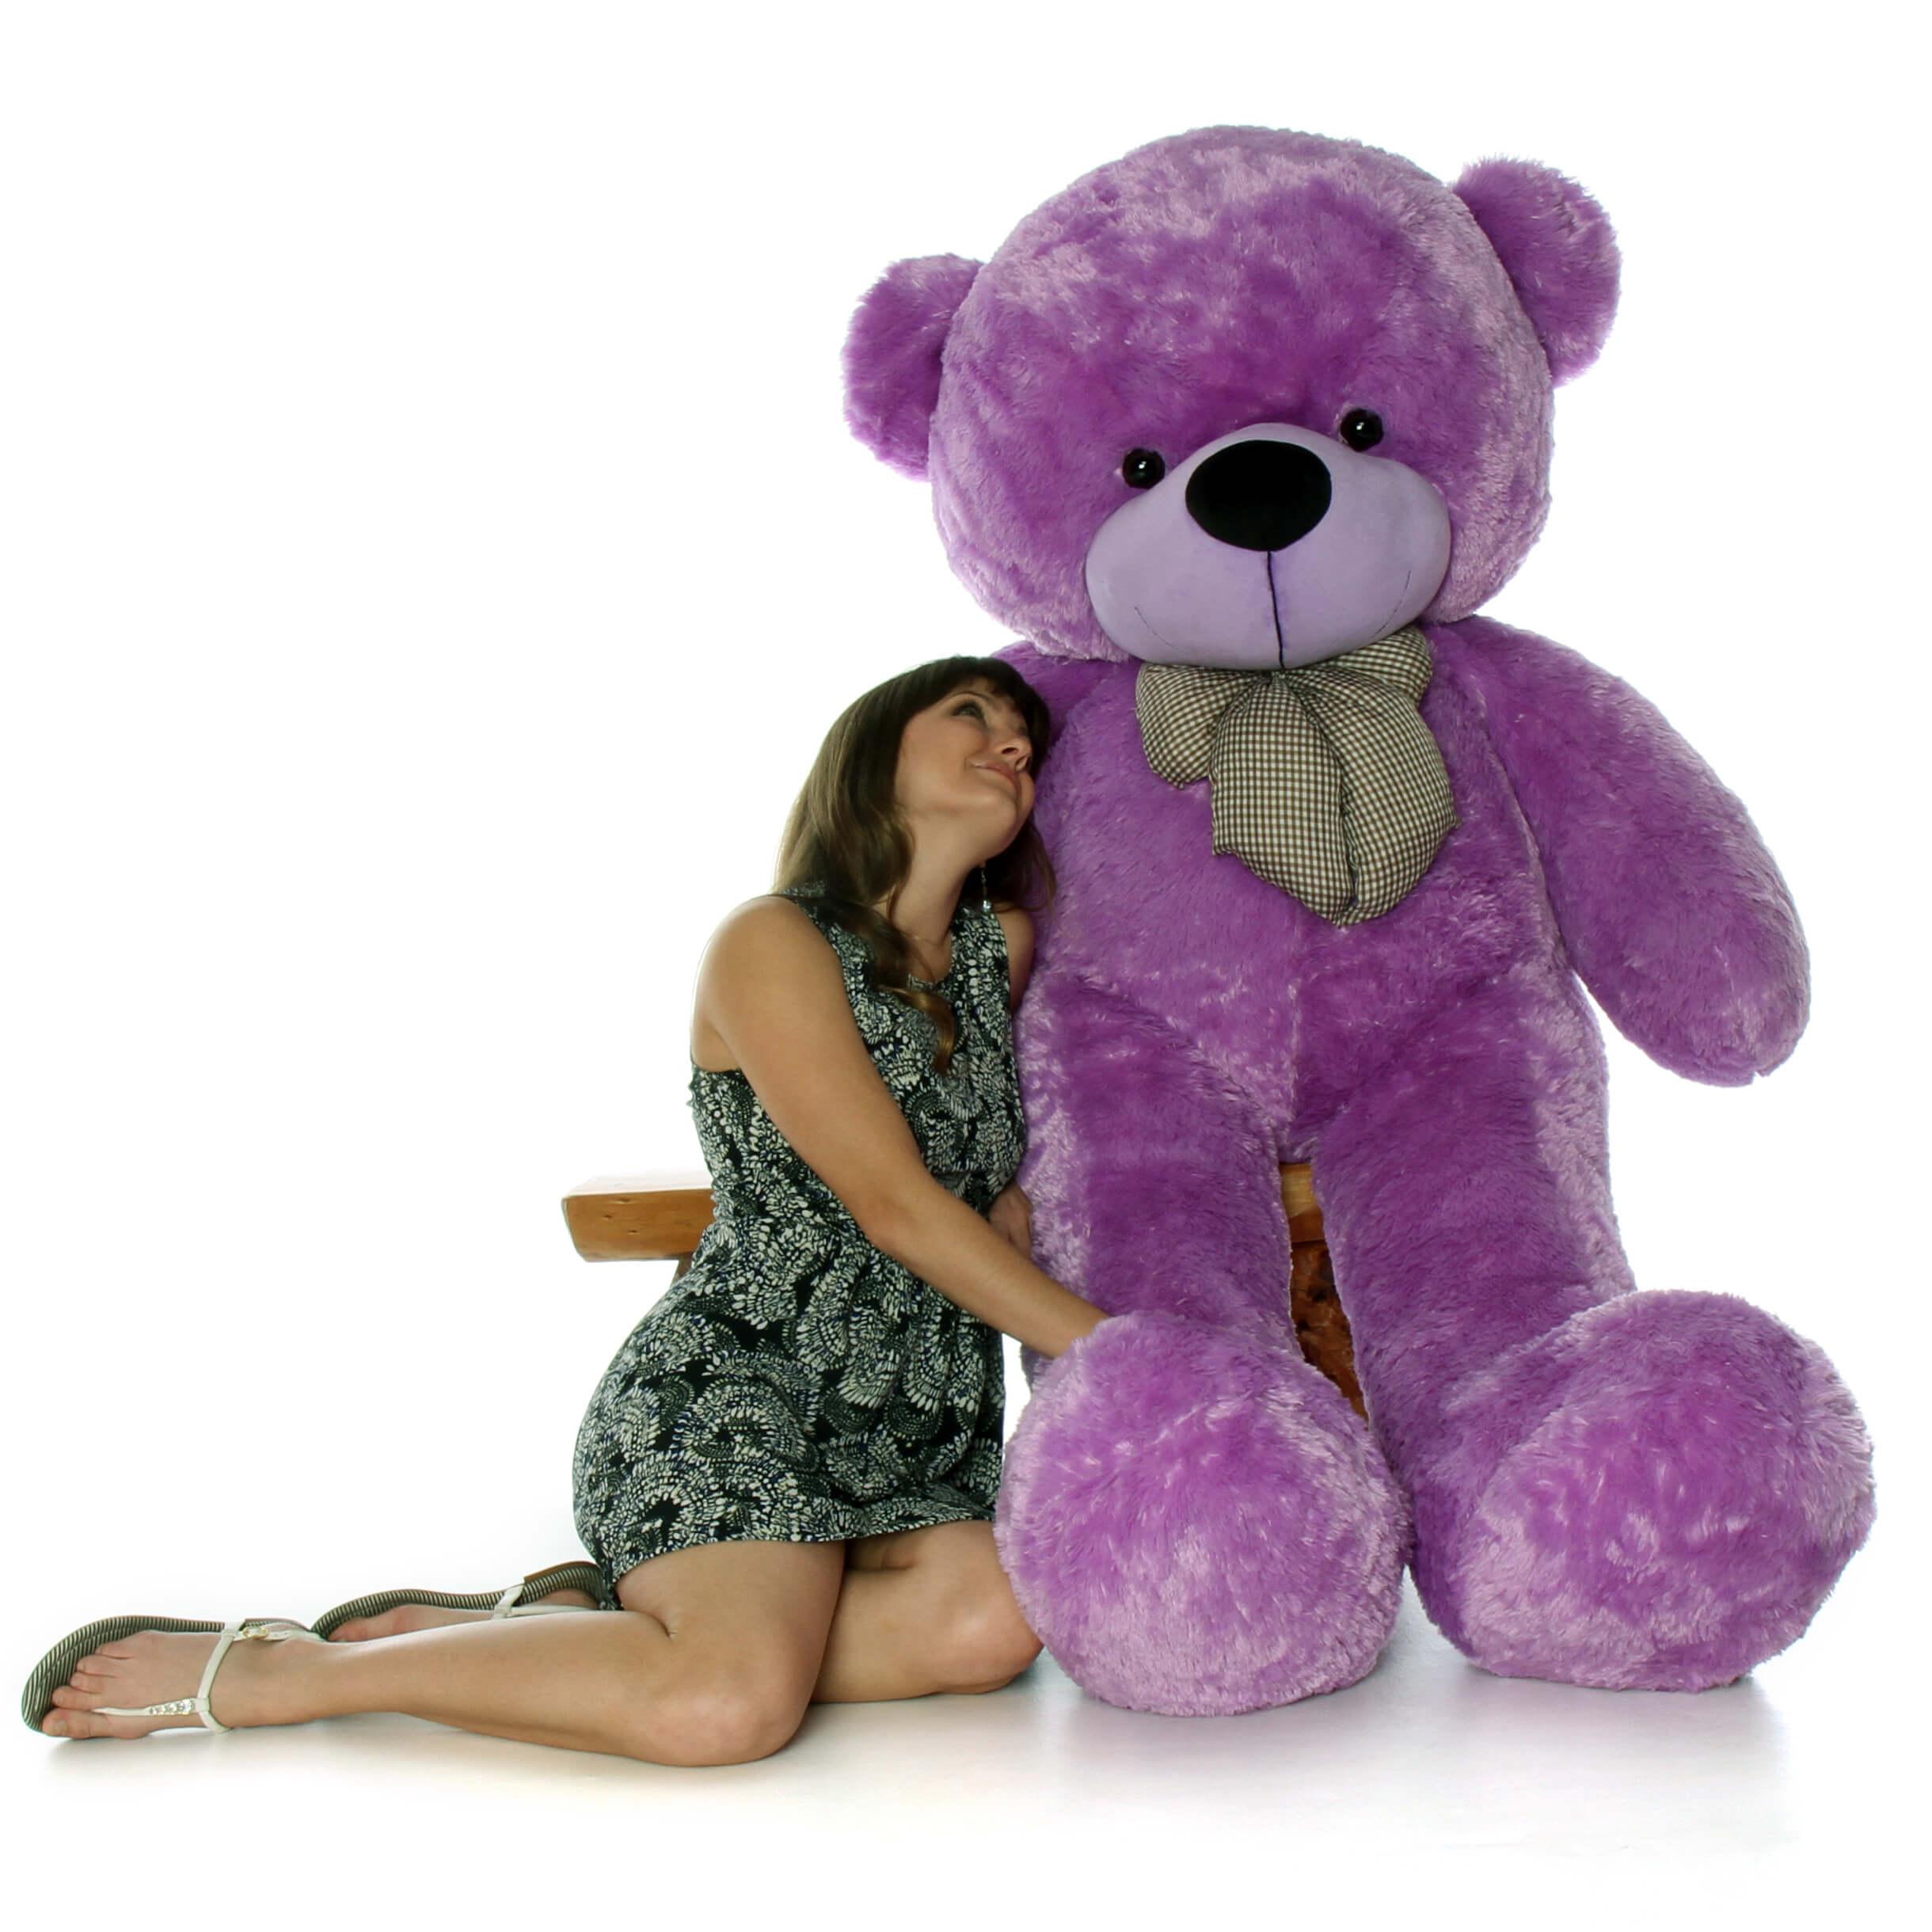 6ft-purple-life-size-teddy-deedee-cuddle